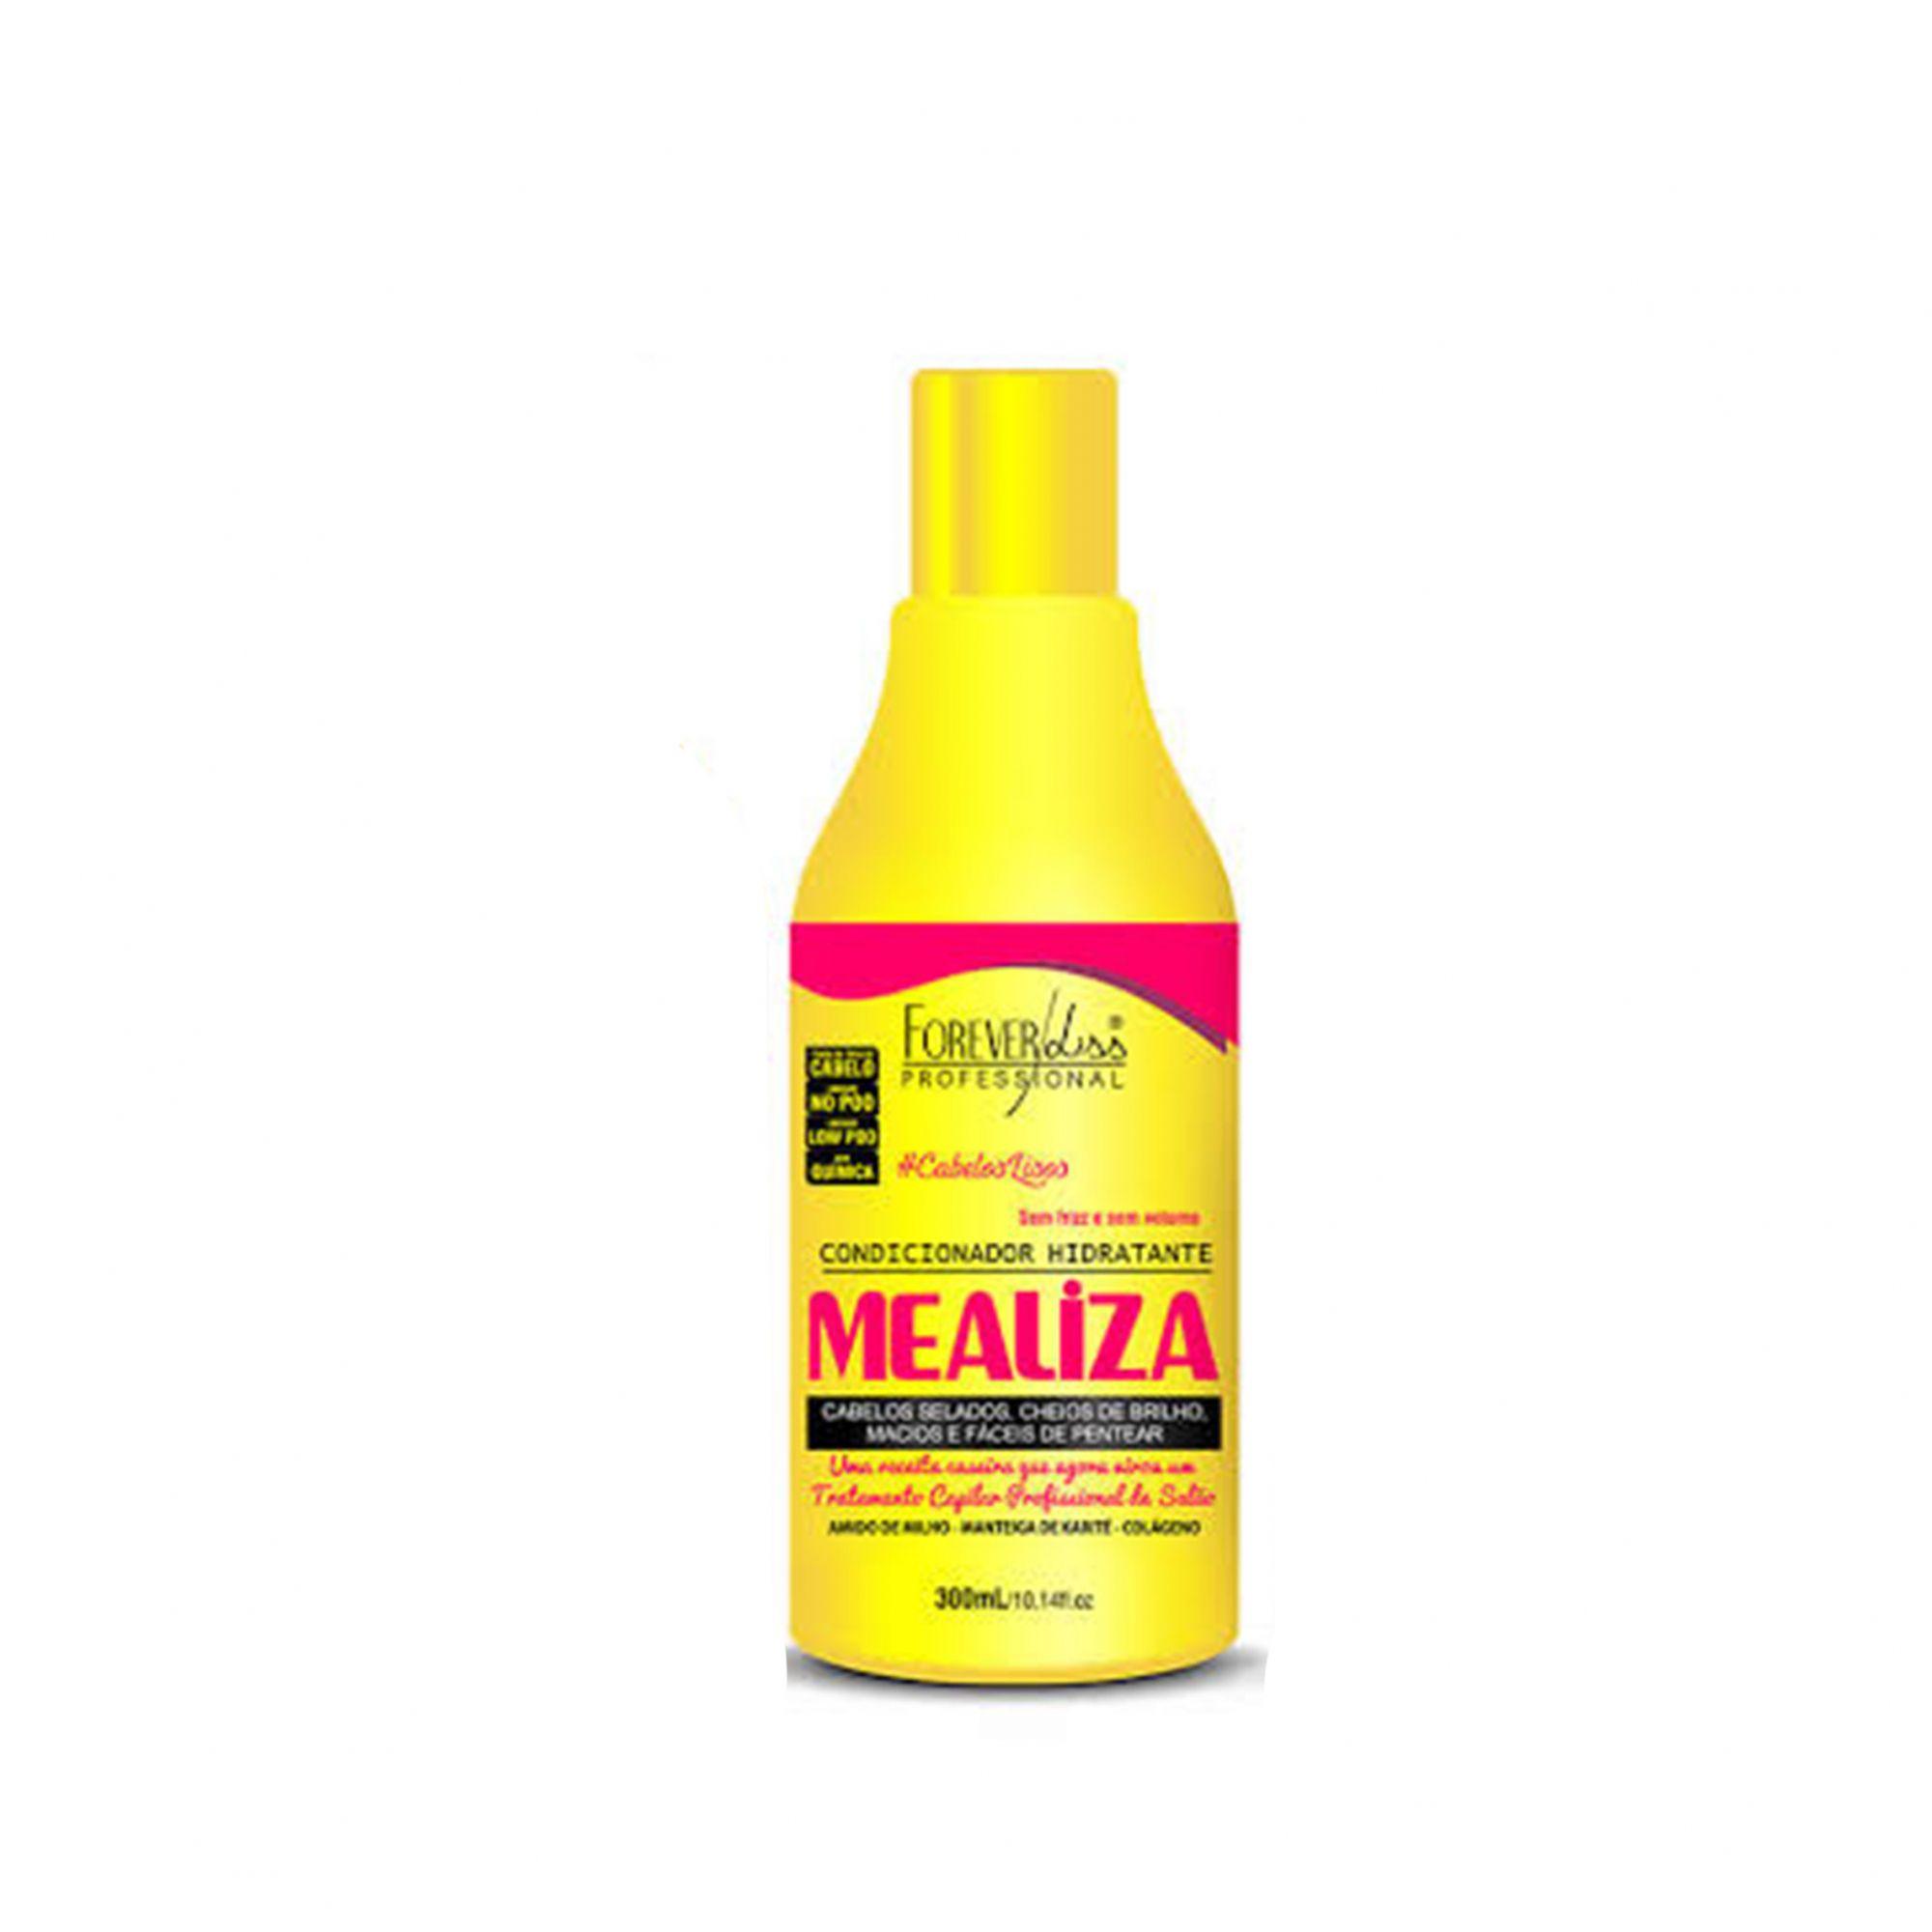 Condicionador MeAliza Forever Liss 300ml.